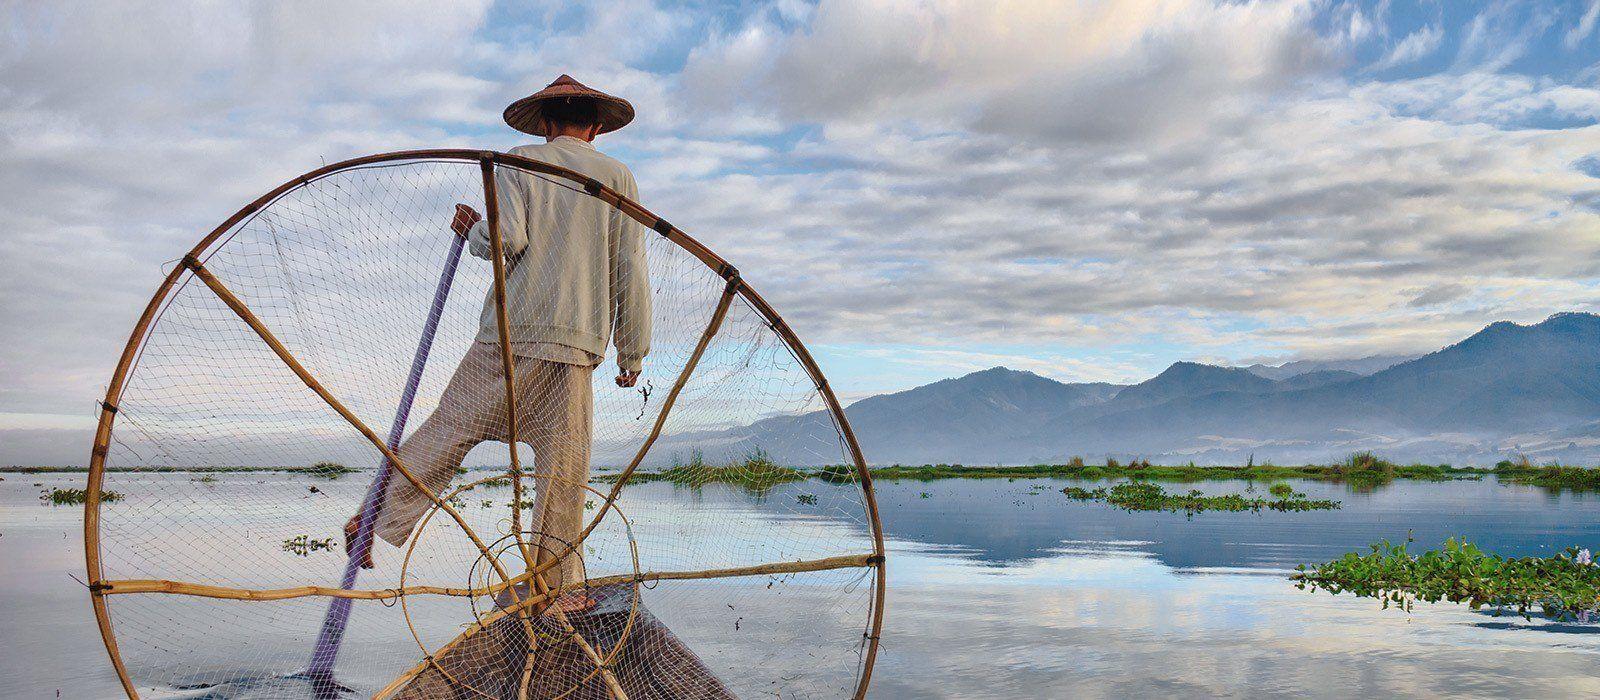 Destination Inle Lake Myanmar